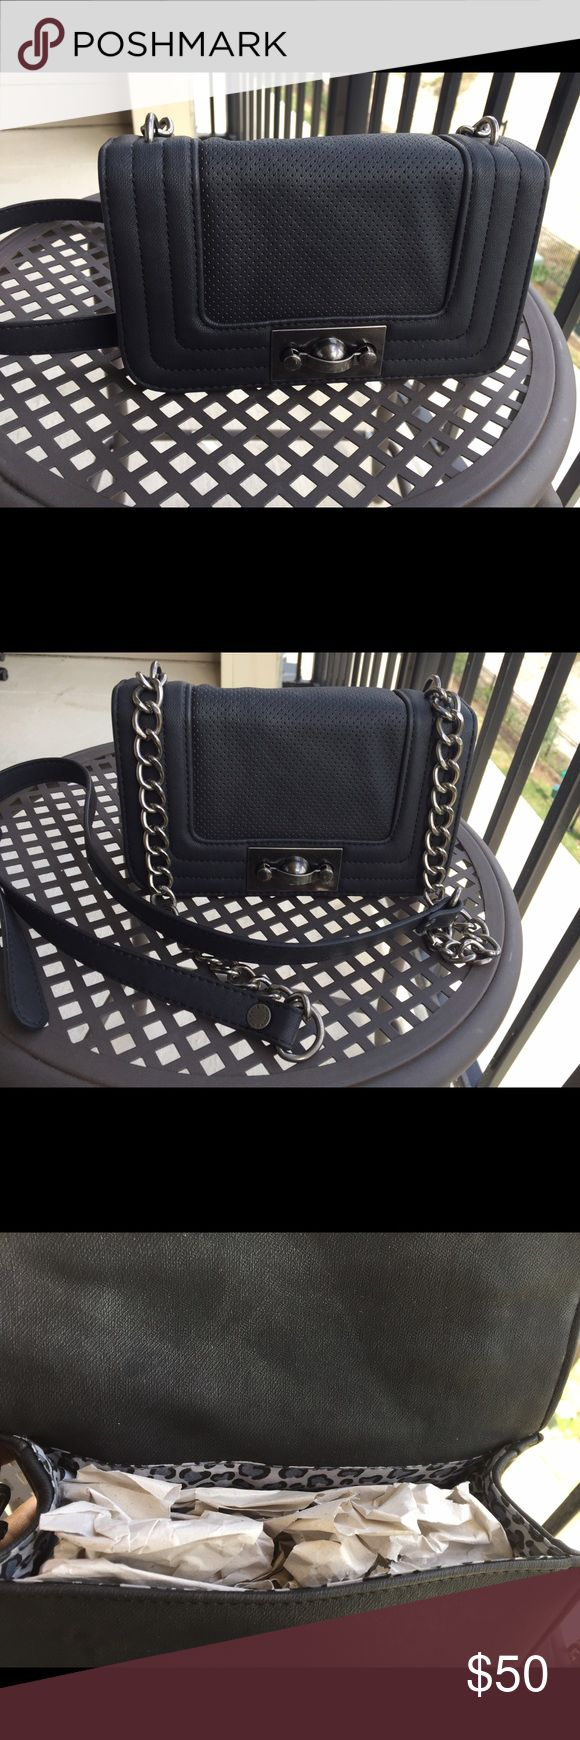 Steve Madden Purse Black and grey Steve Madden purse. Steve Madden Bags Shoulder Bags